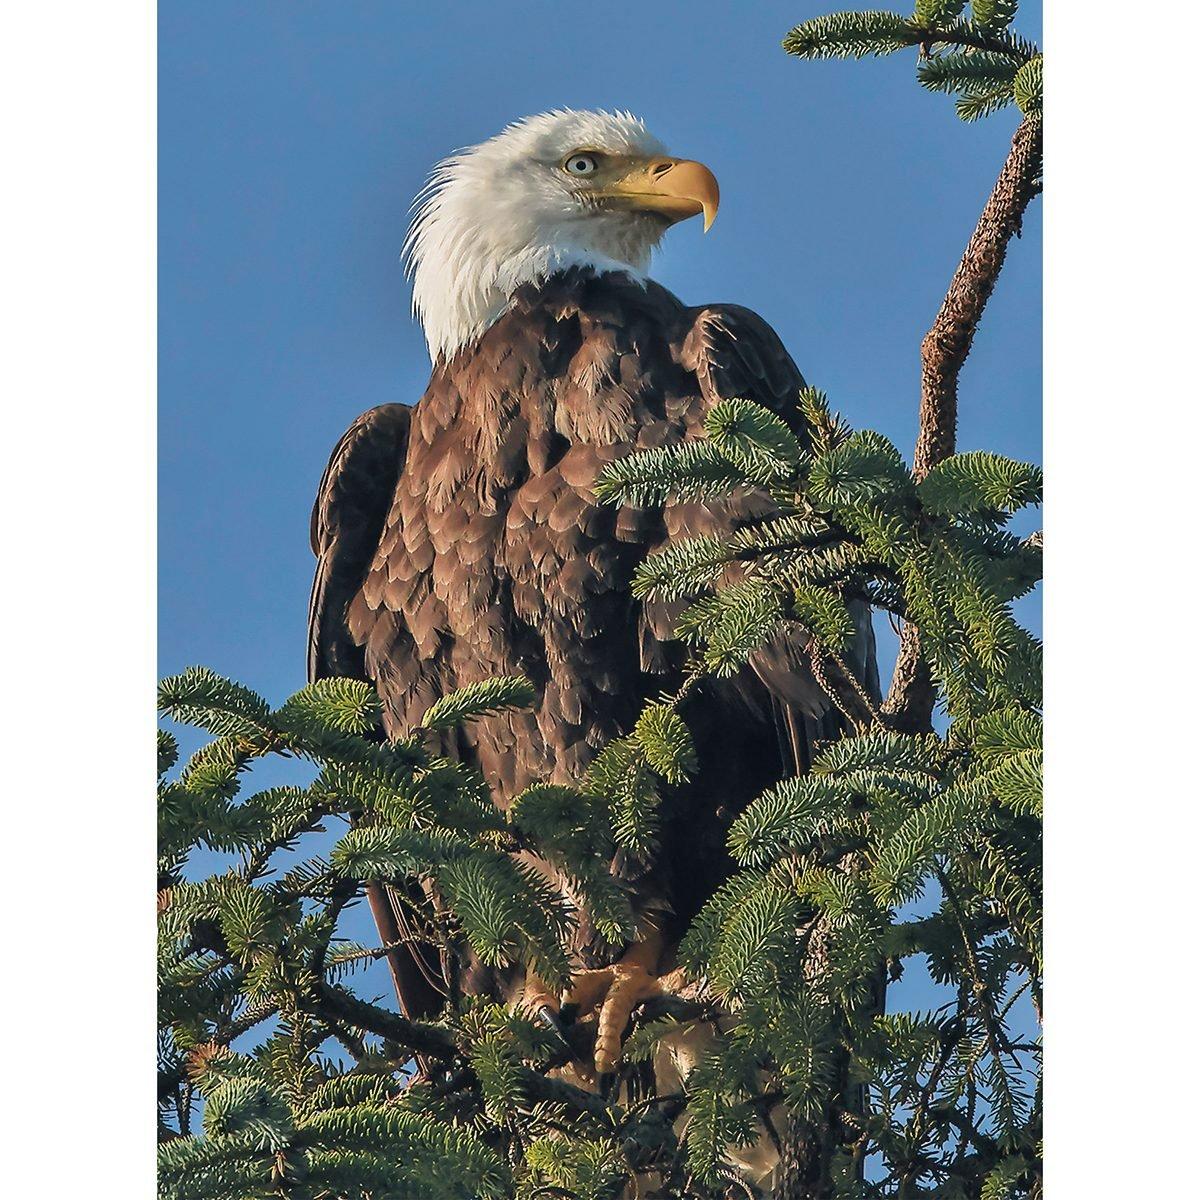 Canadian bird stories - bald eagle